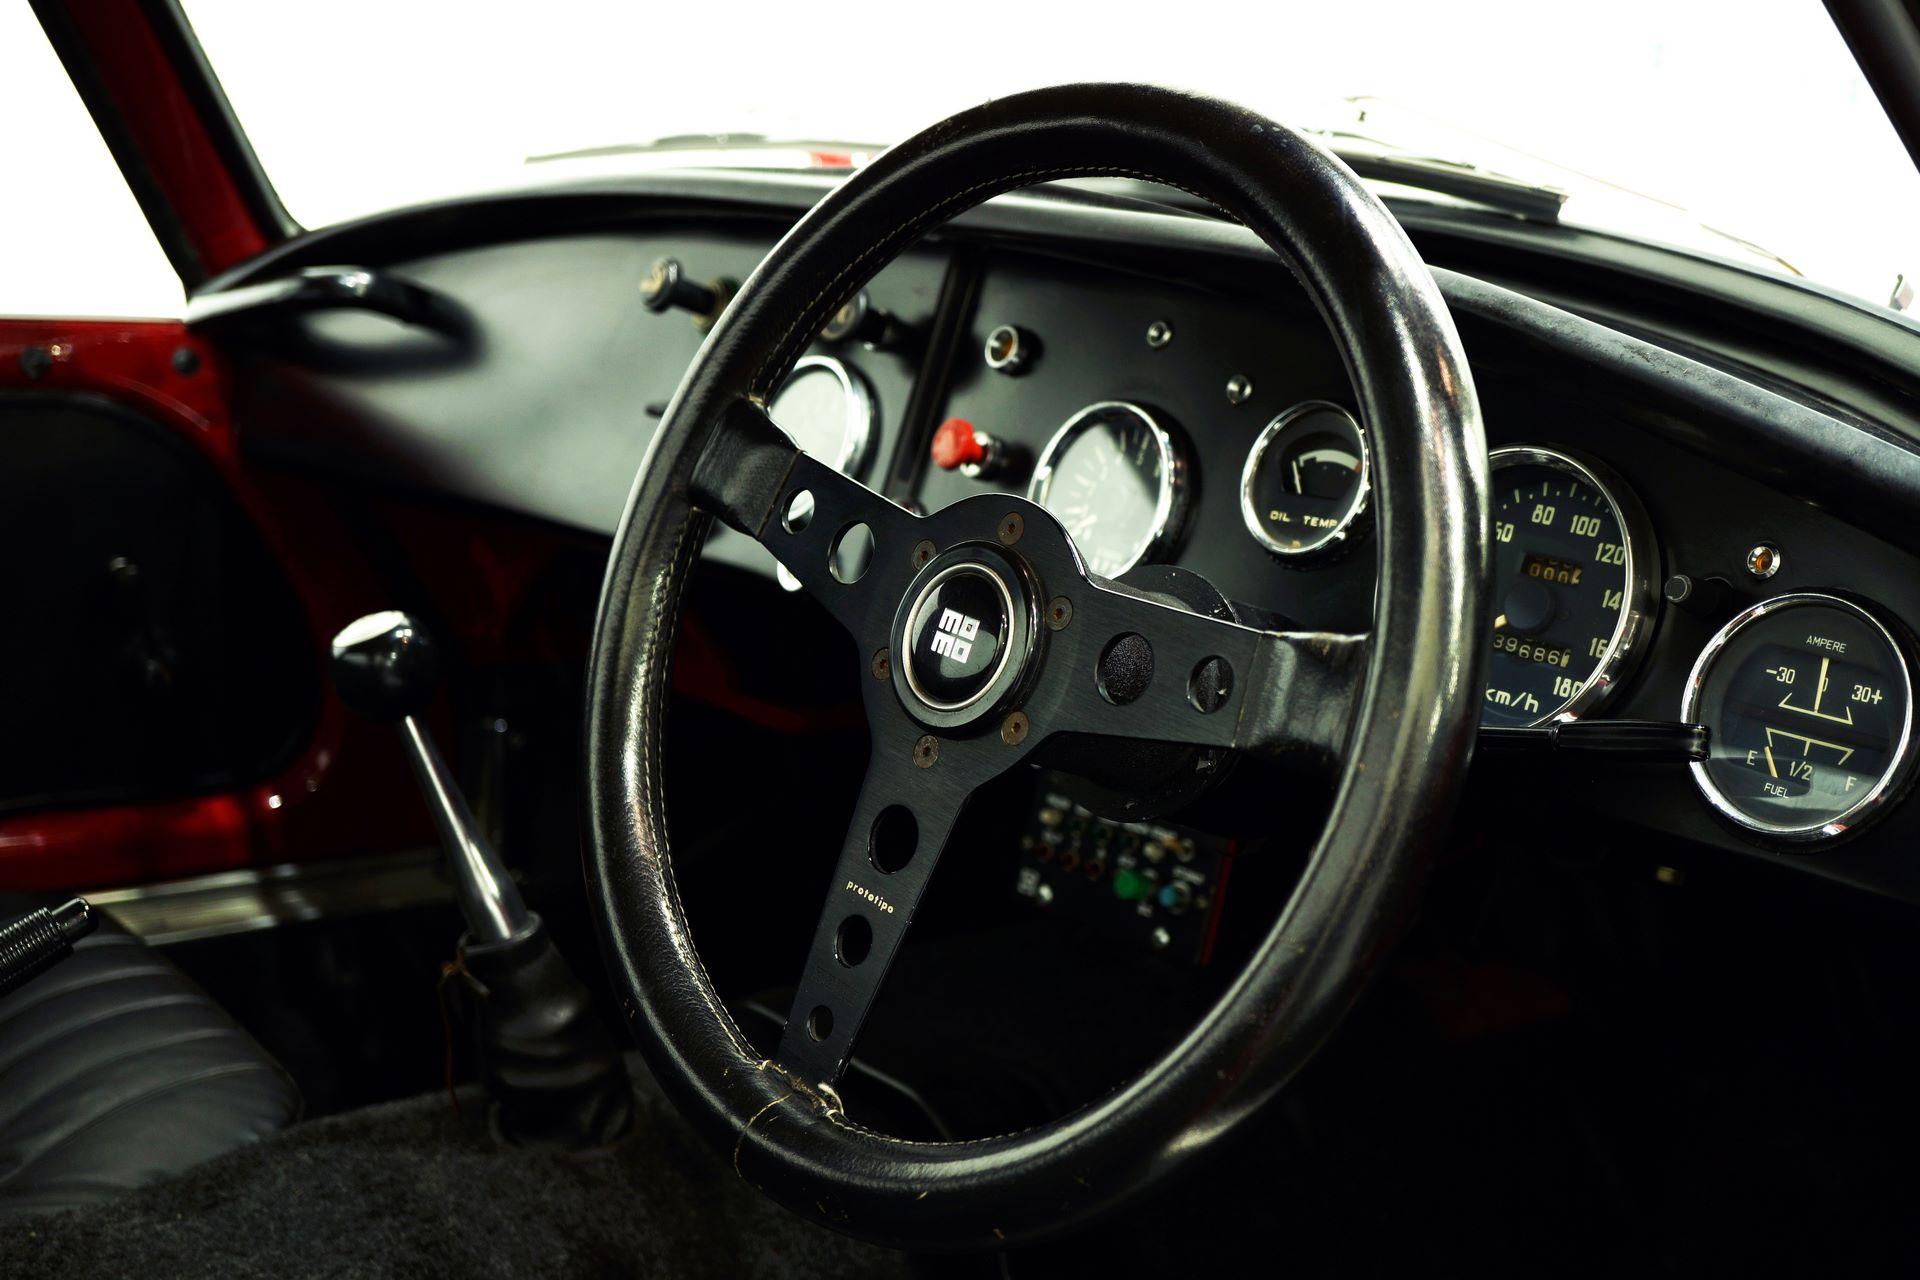 Toyota-Sports-800-Gas-Turbine-Hybrid-concept-1977-21